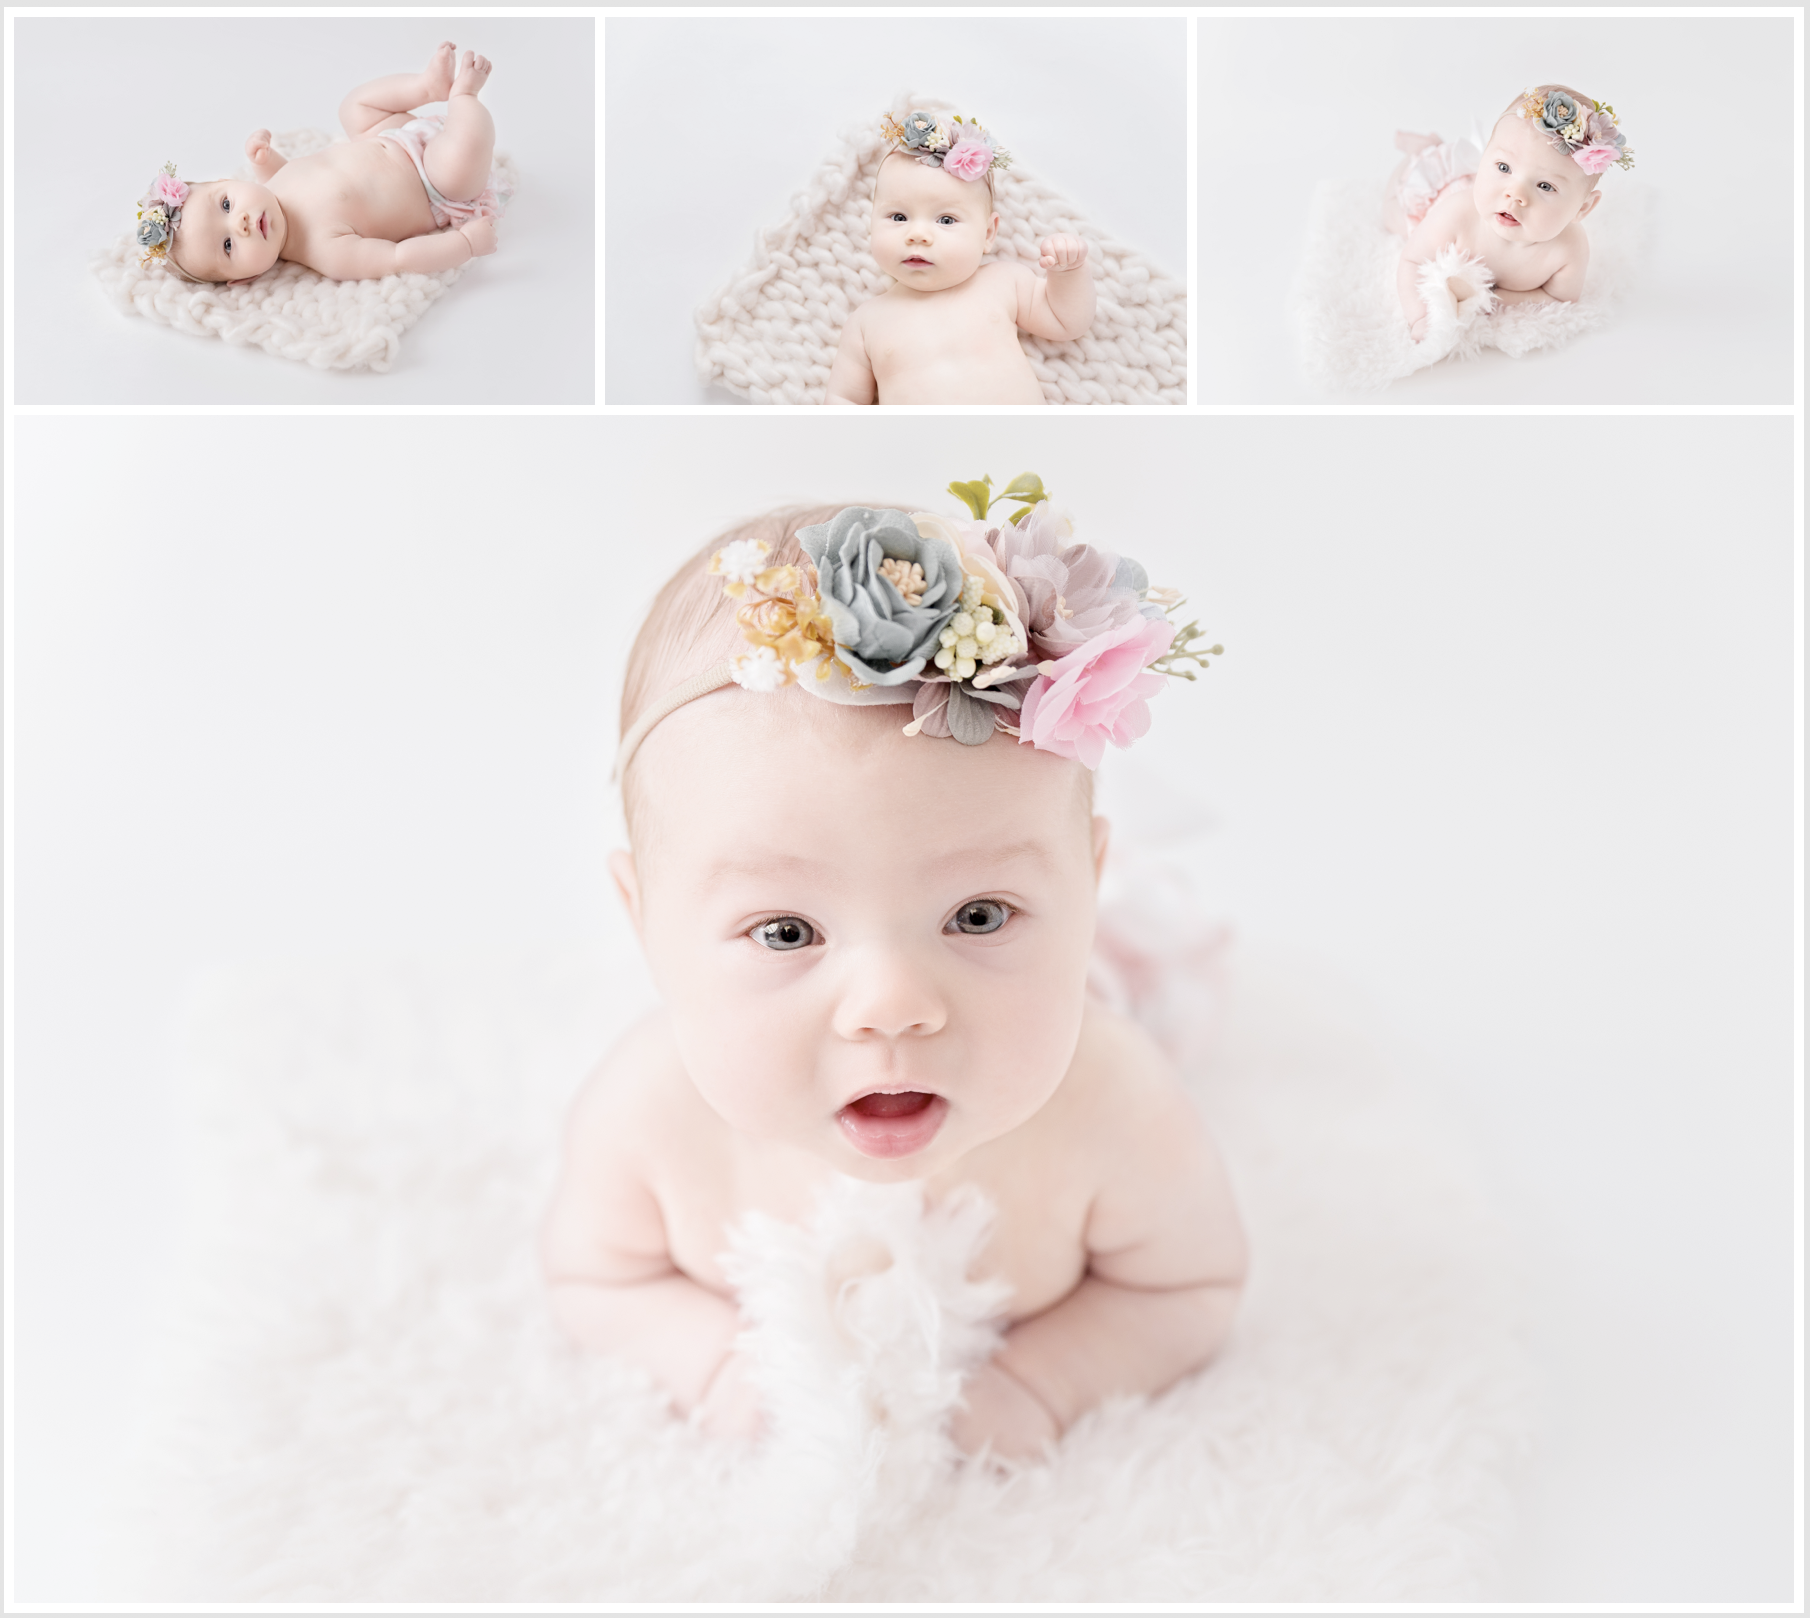 Milestone-photos-baby-images-infant-photography-newborn-pictures-spokane-wasington